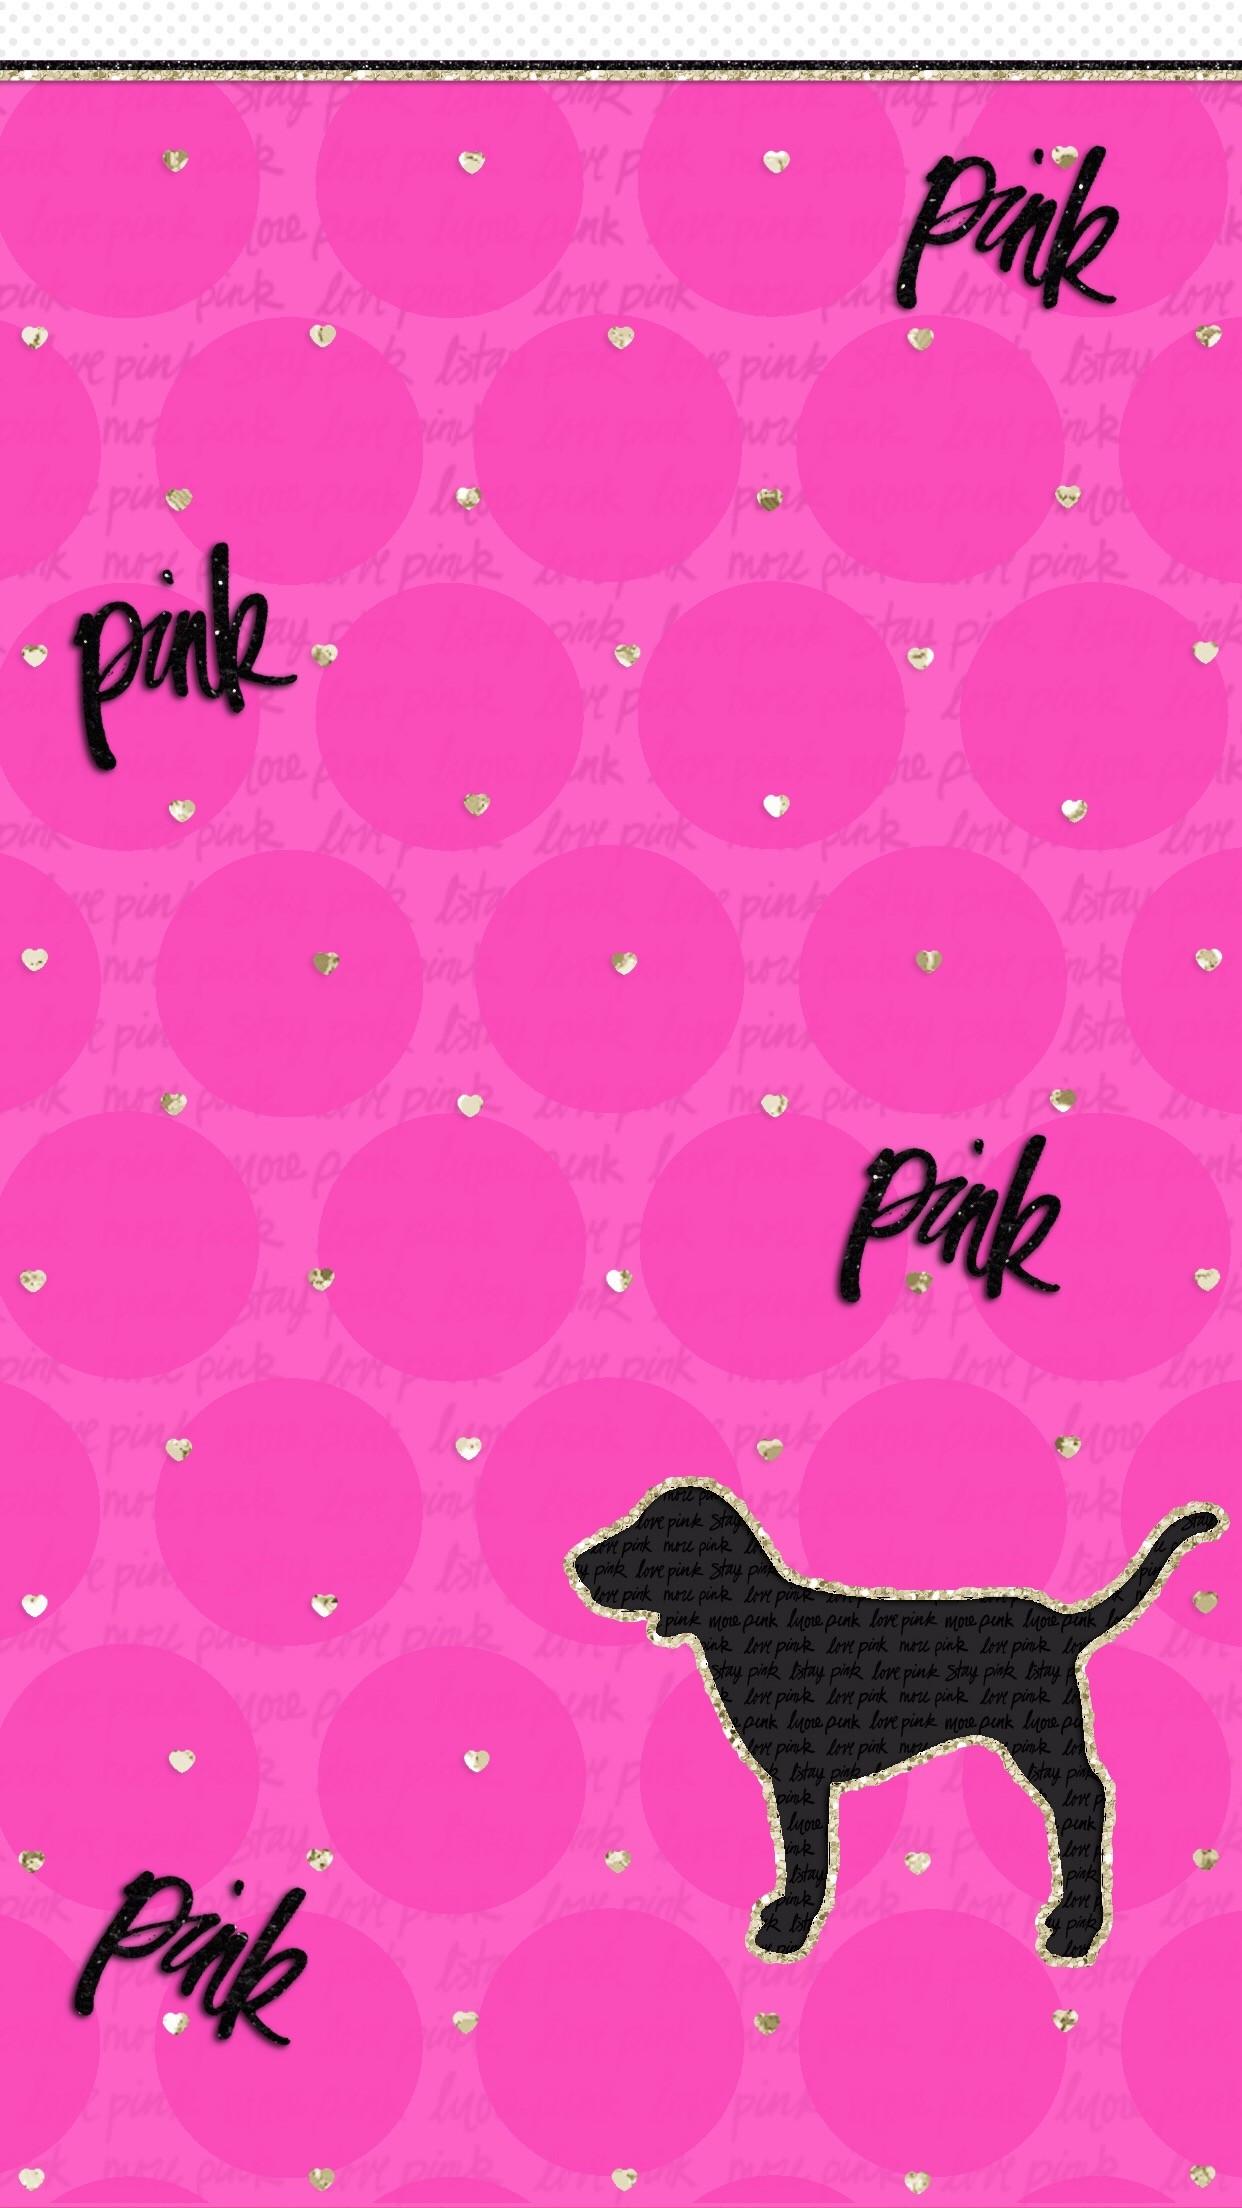 Pink Punk Wallpaper 53 images